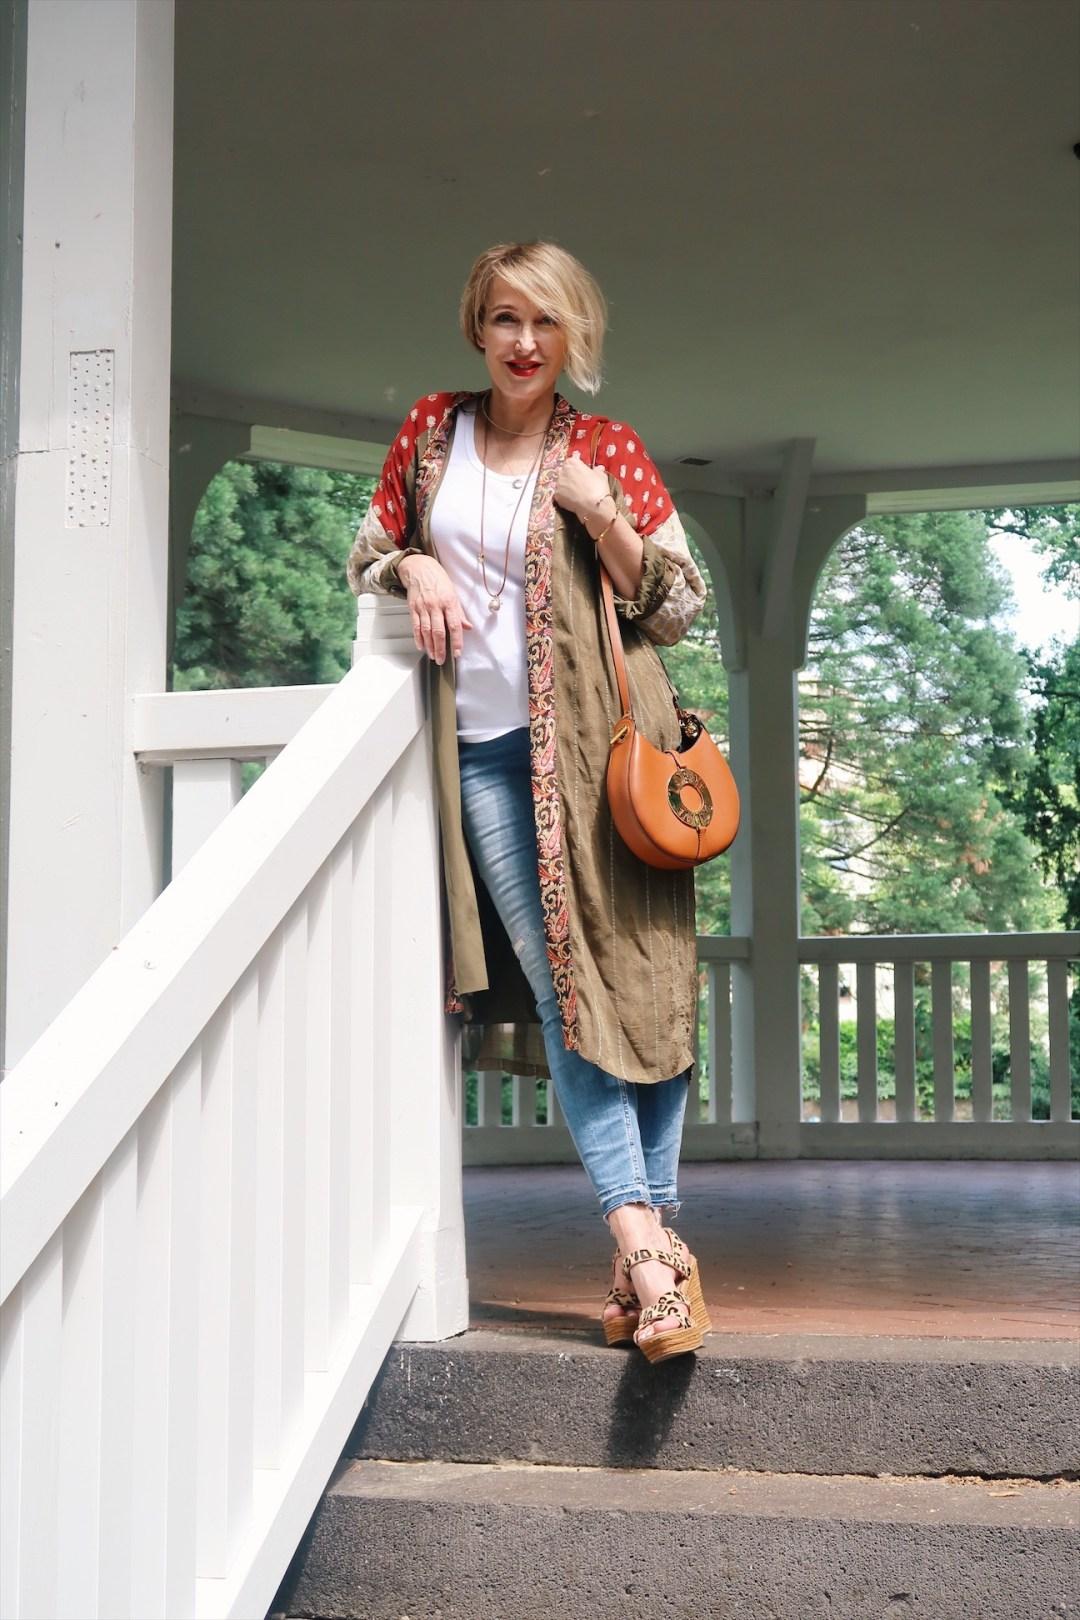 glamupyourlifestyle kimono kimono-trend seidenmantel ue-40-blog ü40-mode fashion-blog skinny-jeans loewe-tasche